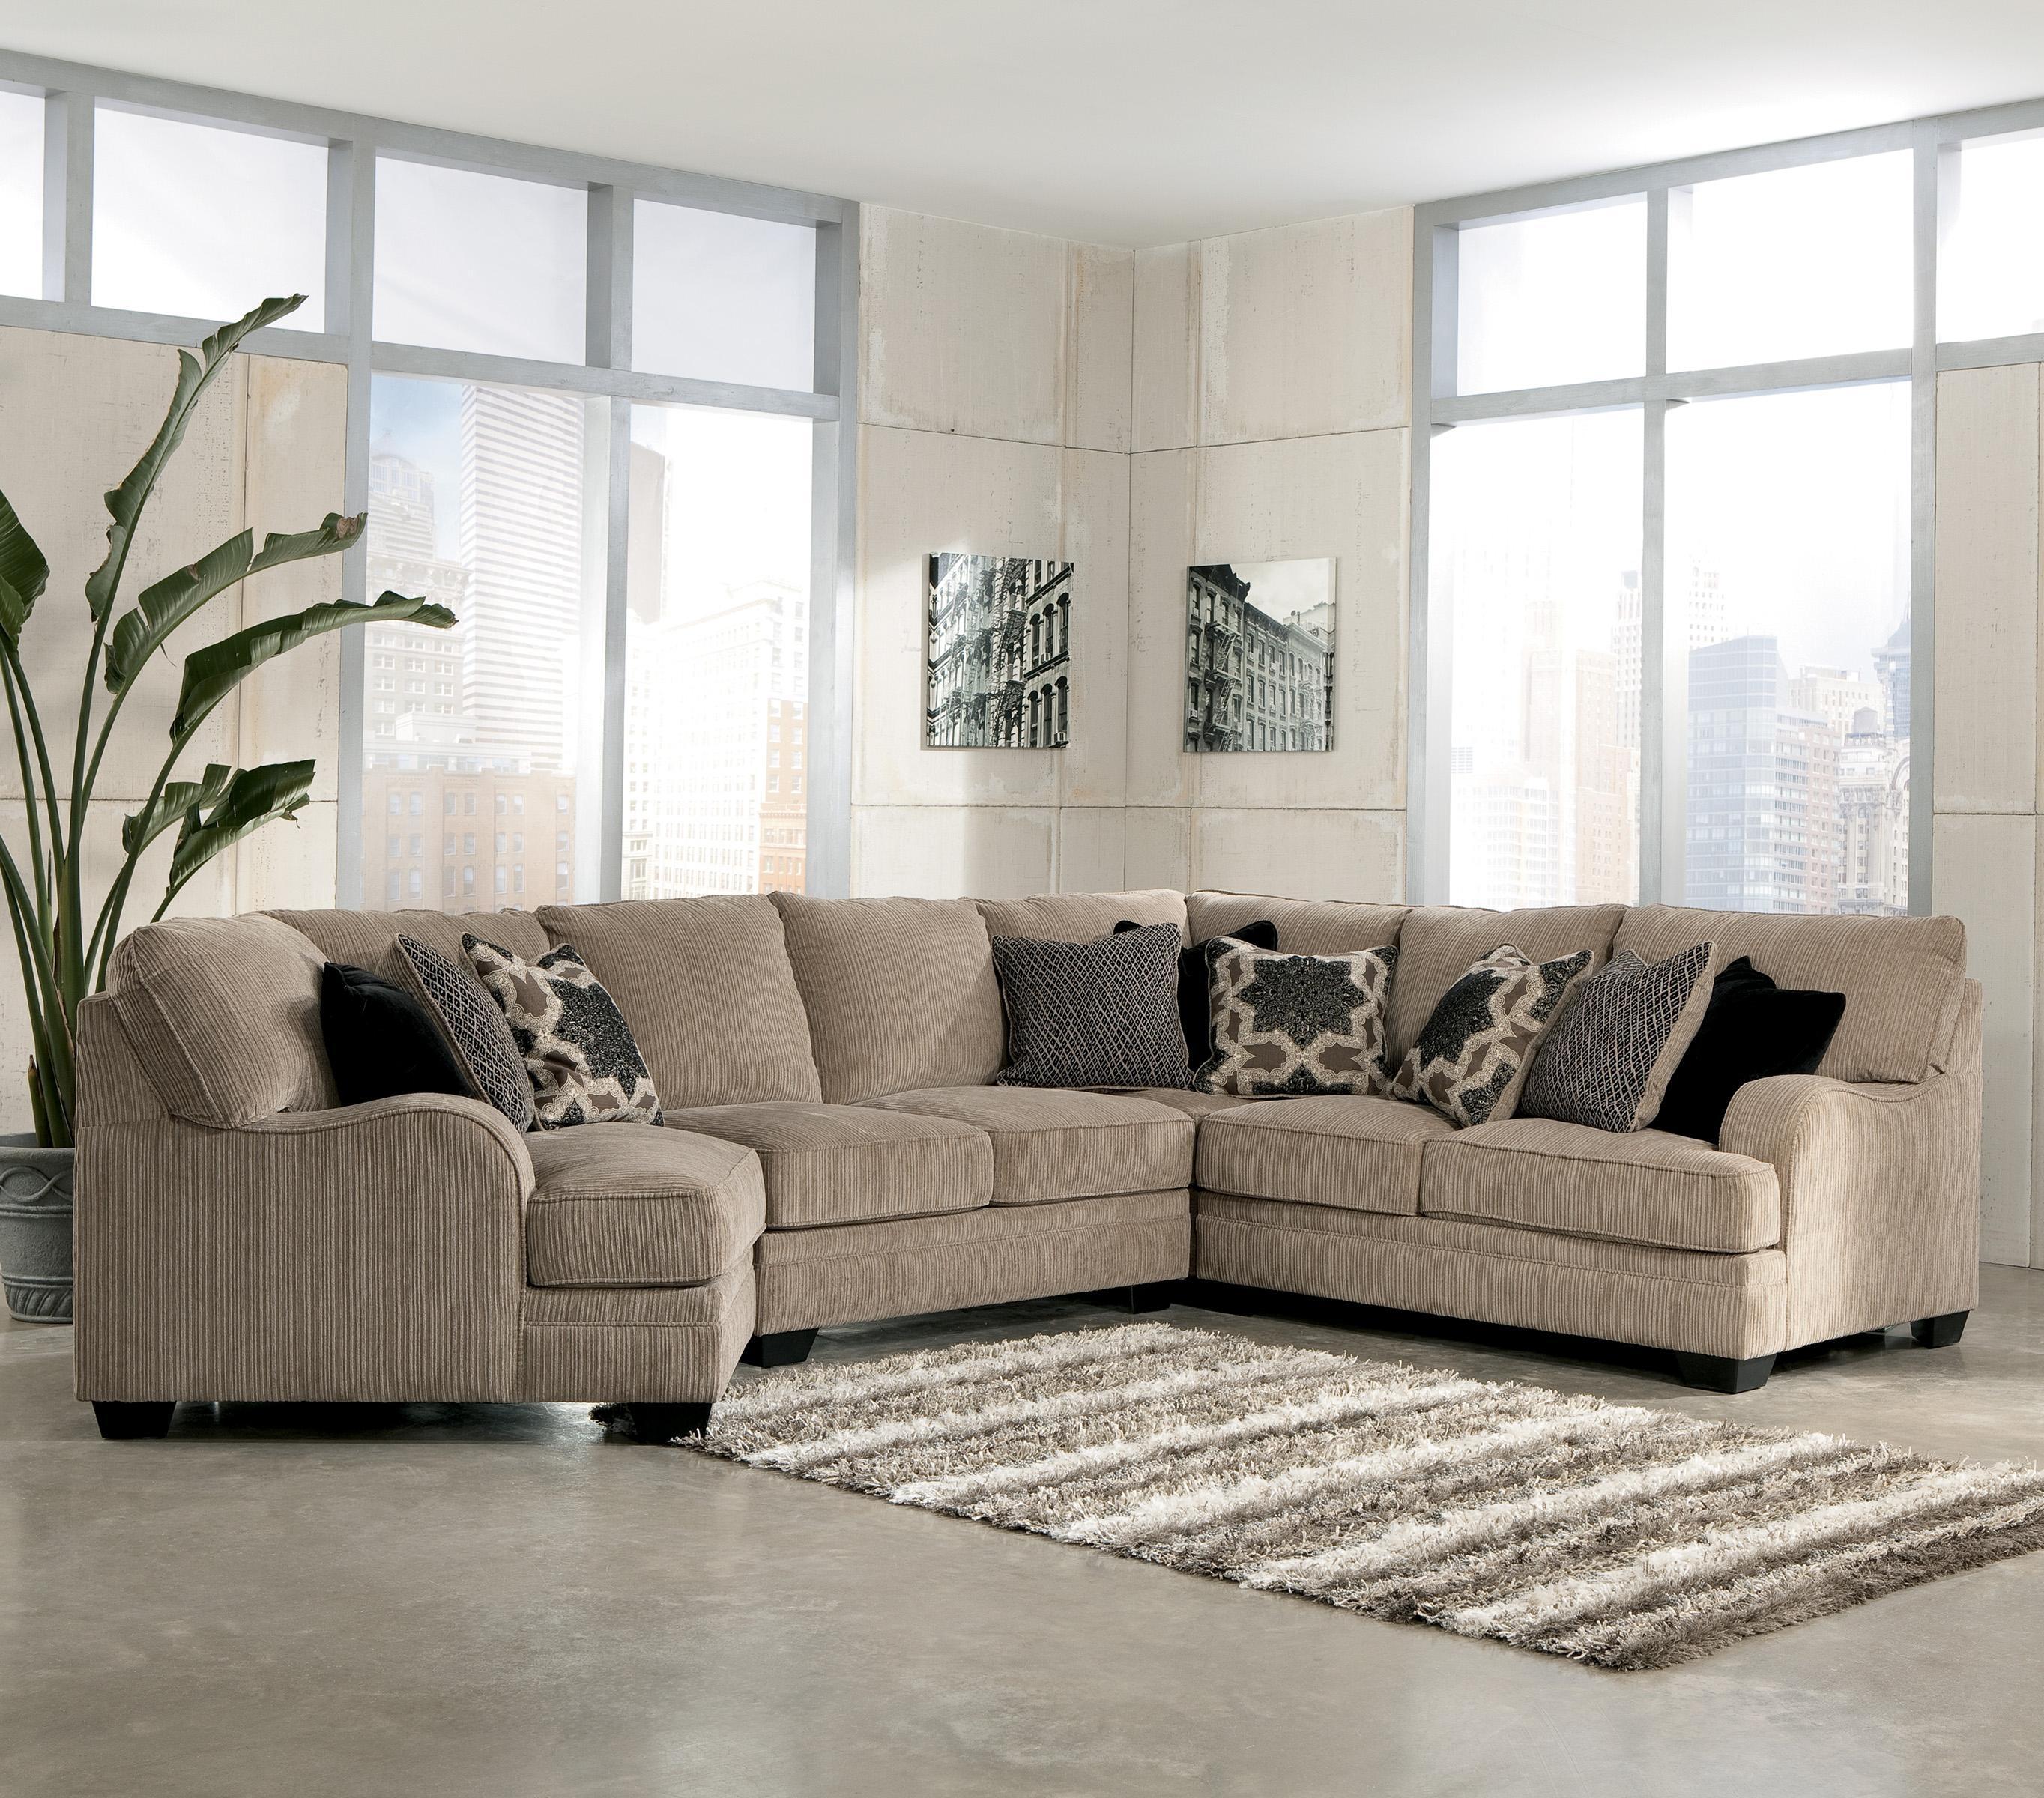 Signature Designashley Katisha - Platinum 4-Piece Sectional Sofa throughout Blaine 4 Piece Sectionals (Image 26 of 30)